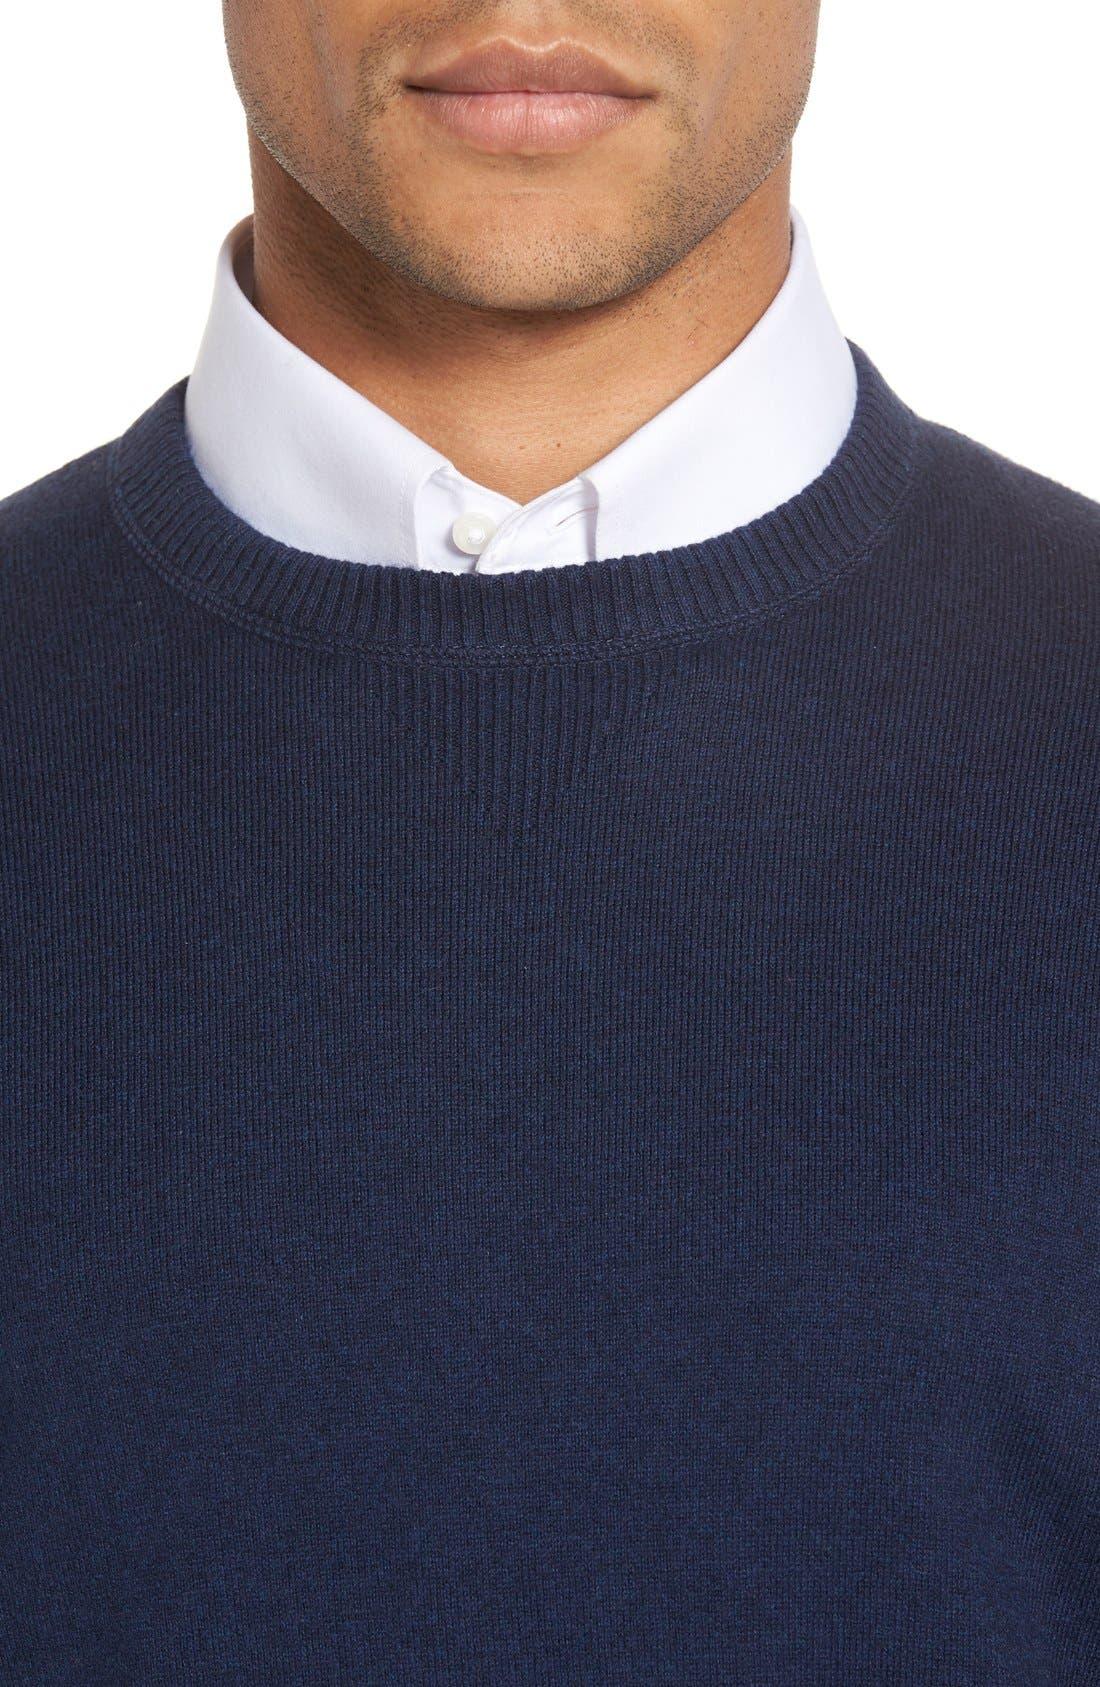 'Jersey Sport' Cotton Blend Crewneck Sweater,                             Alternate thumbnail 29, color,